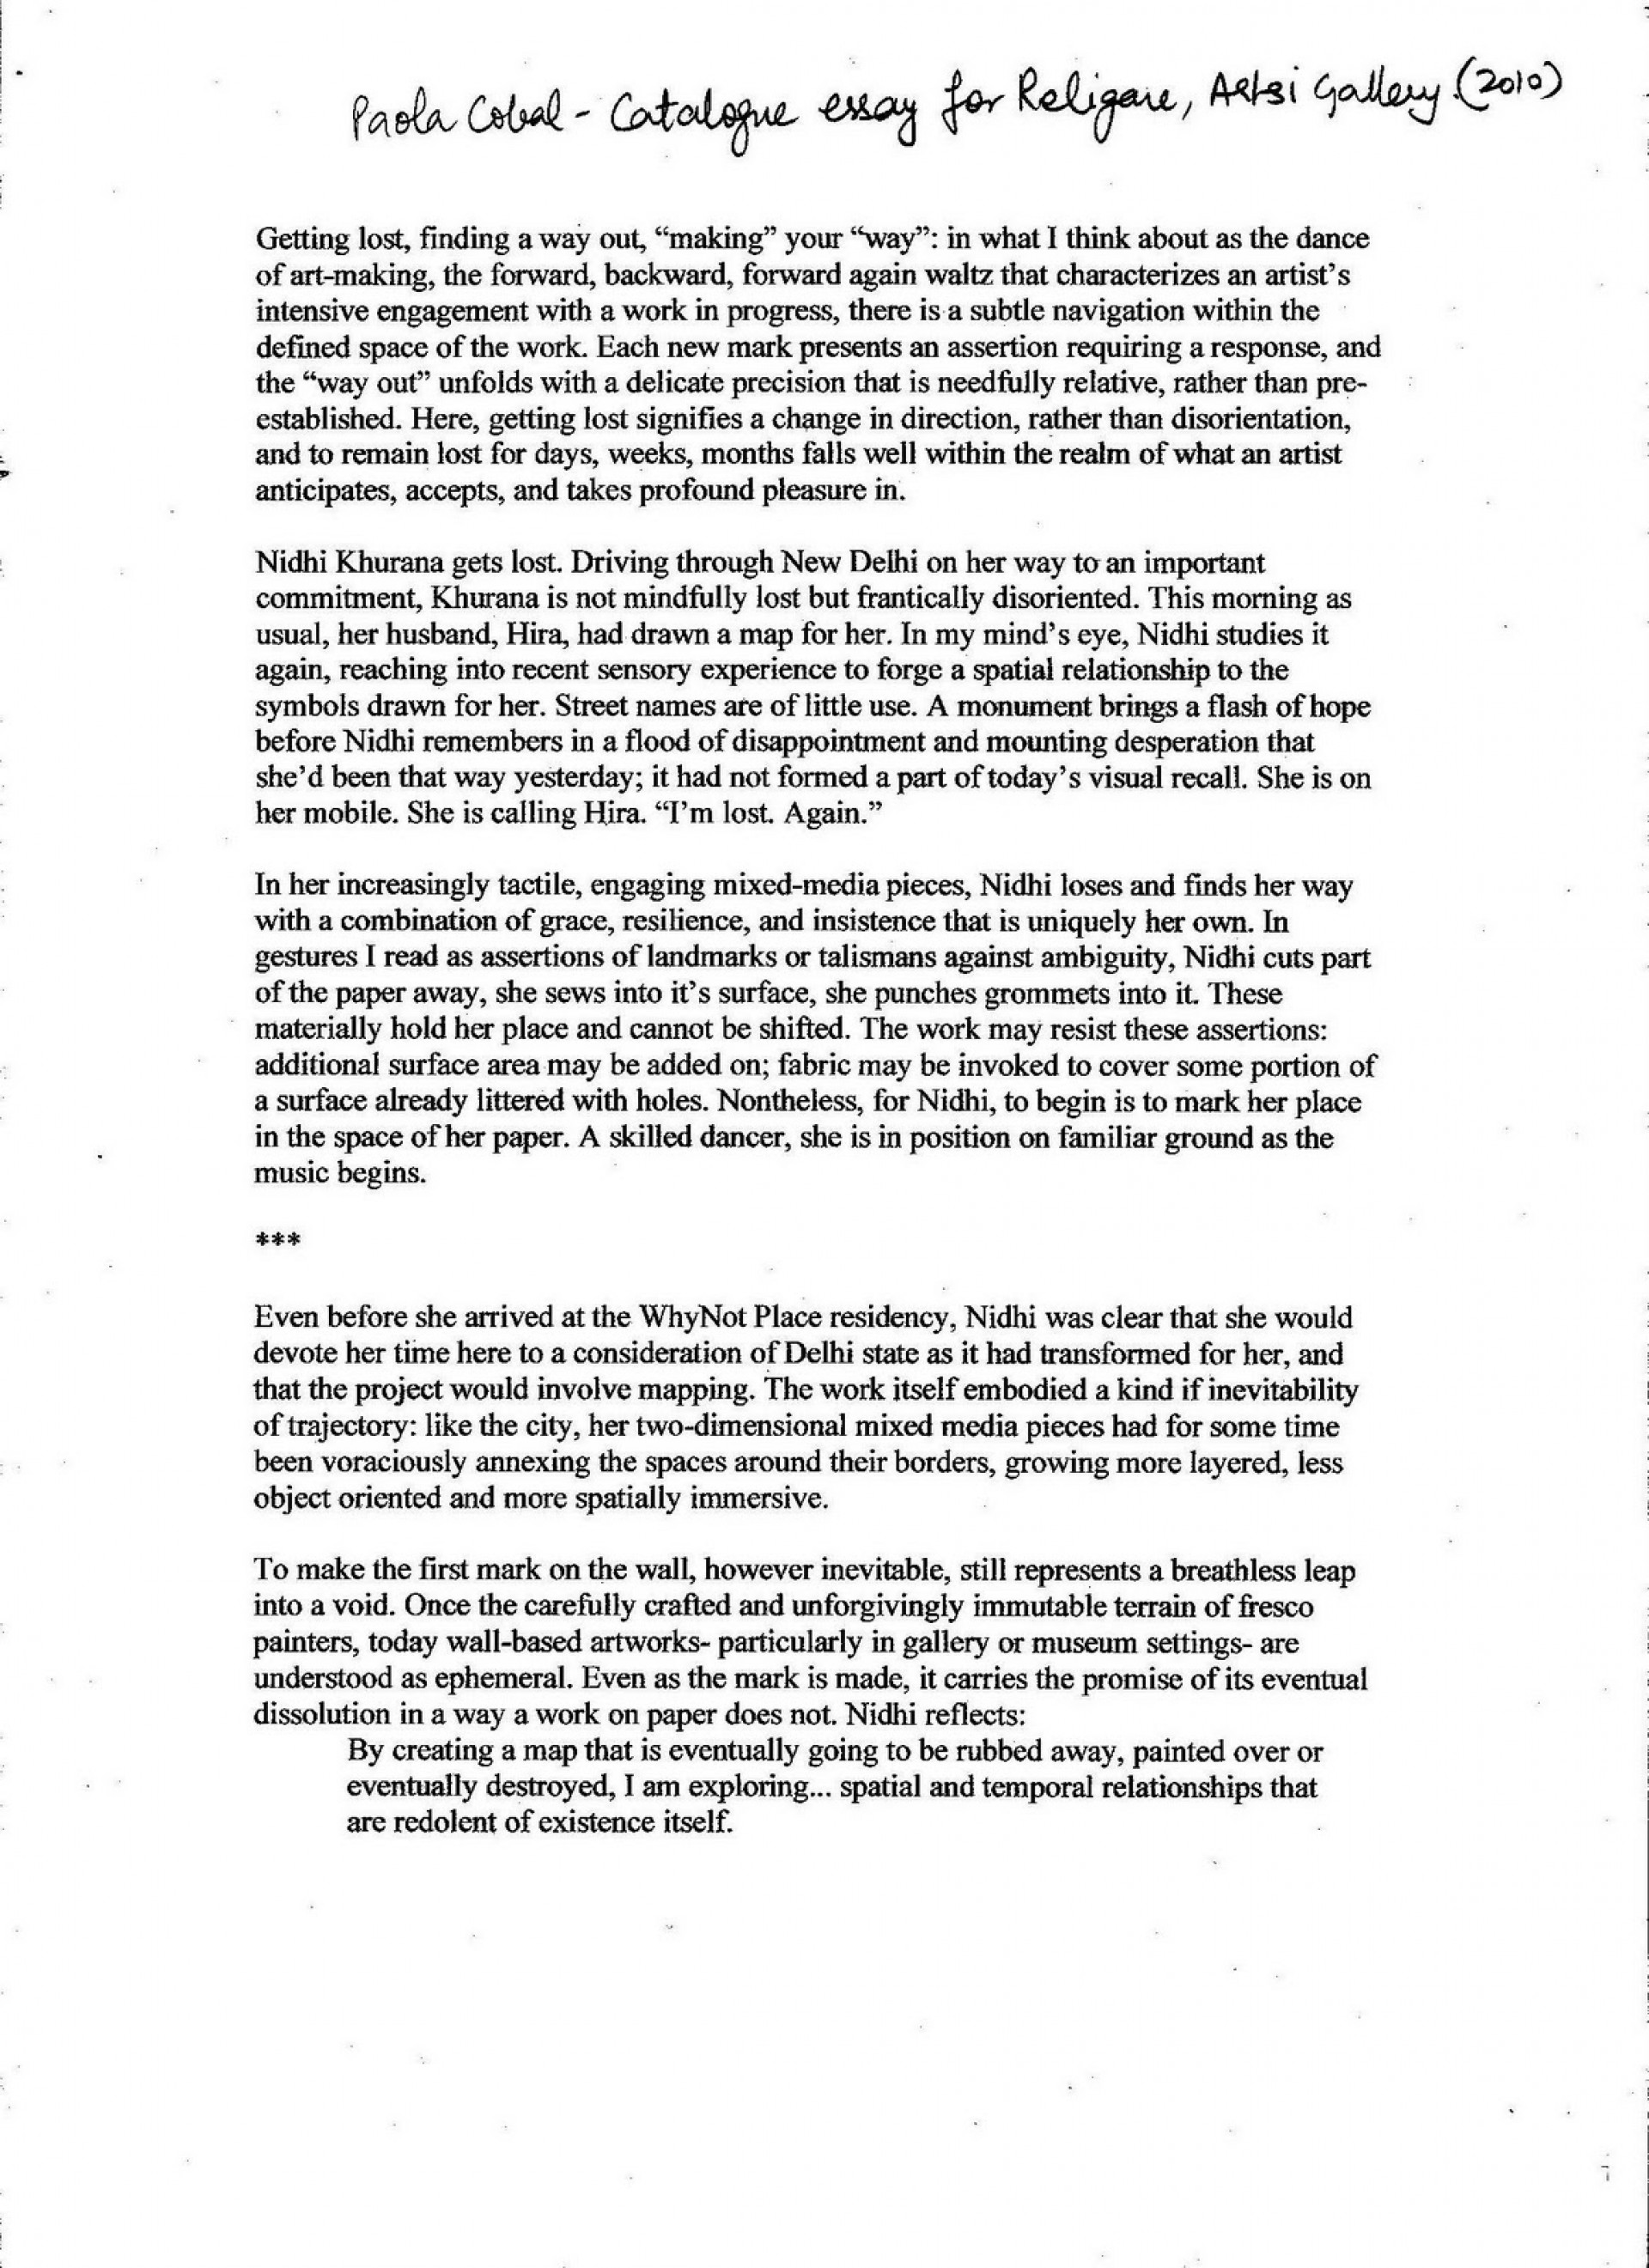 002 Hero Essay Examples Example Staggering My Michigan Superhero 1920